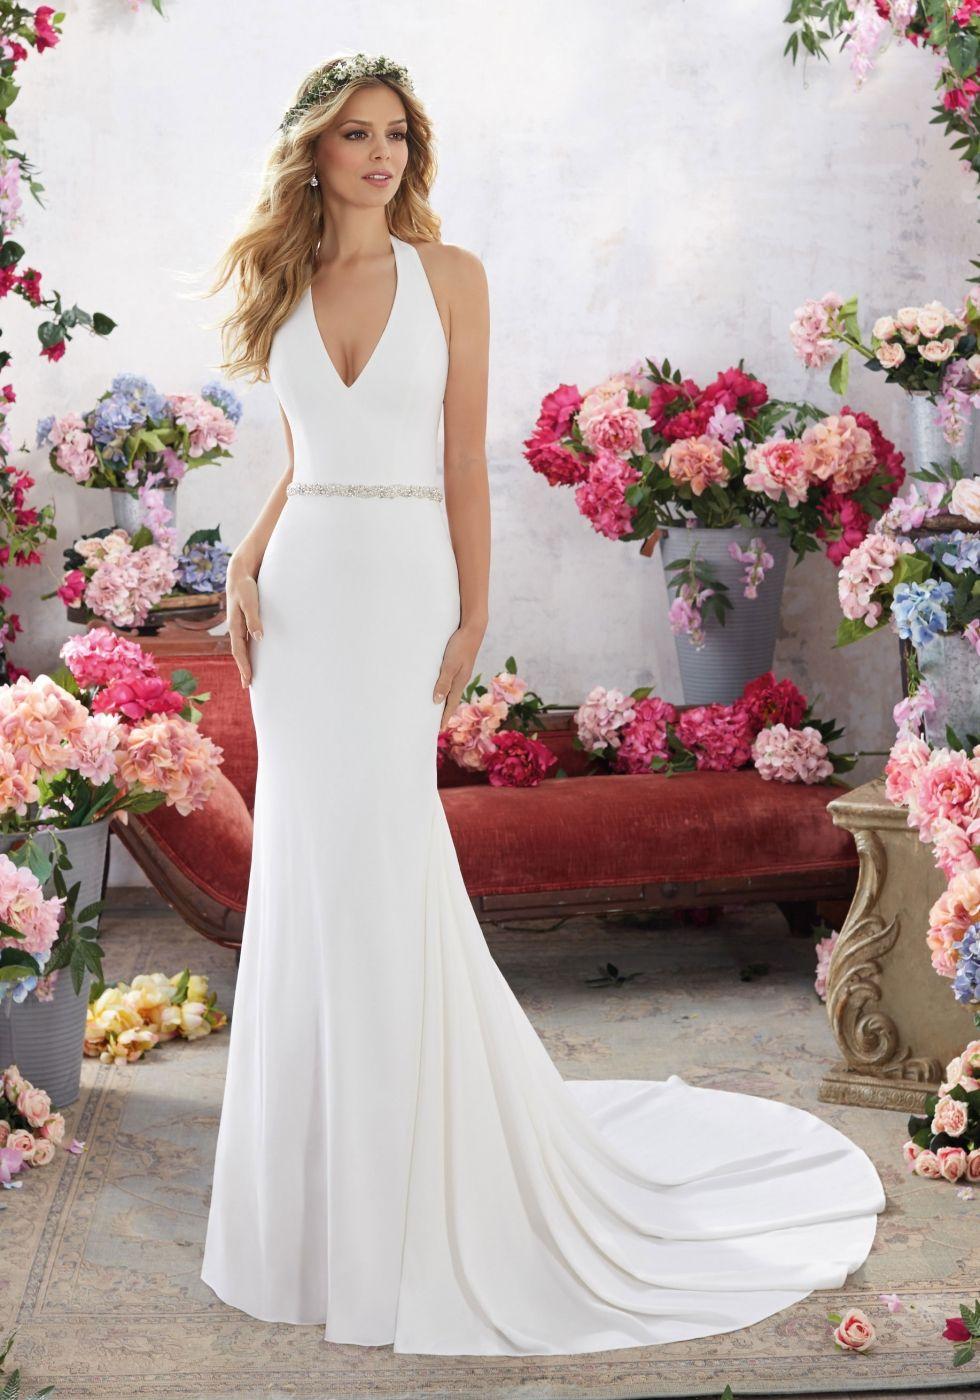 simple wedding dress plain wedding dress halter wedding dress morilee wedding dress